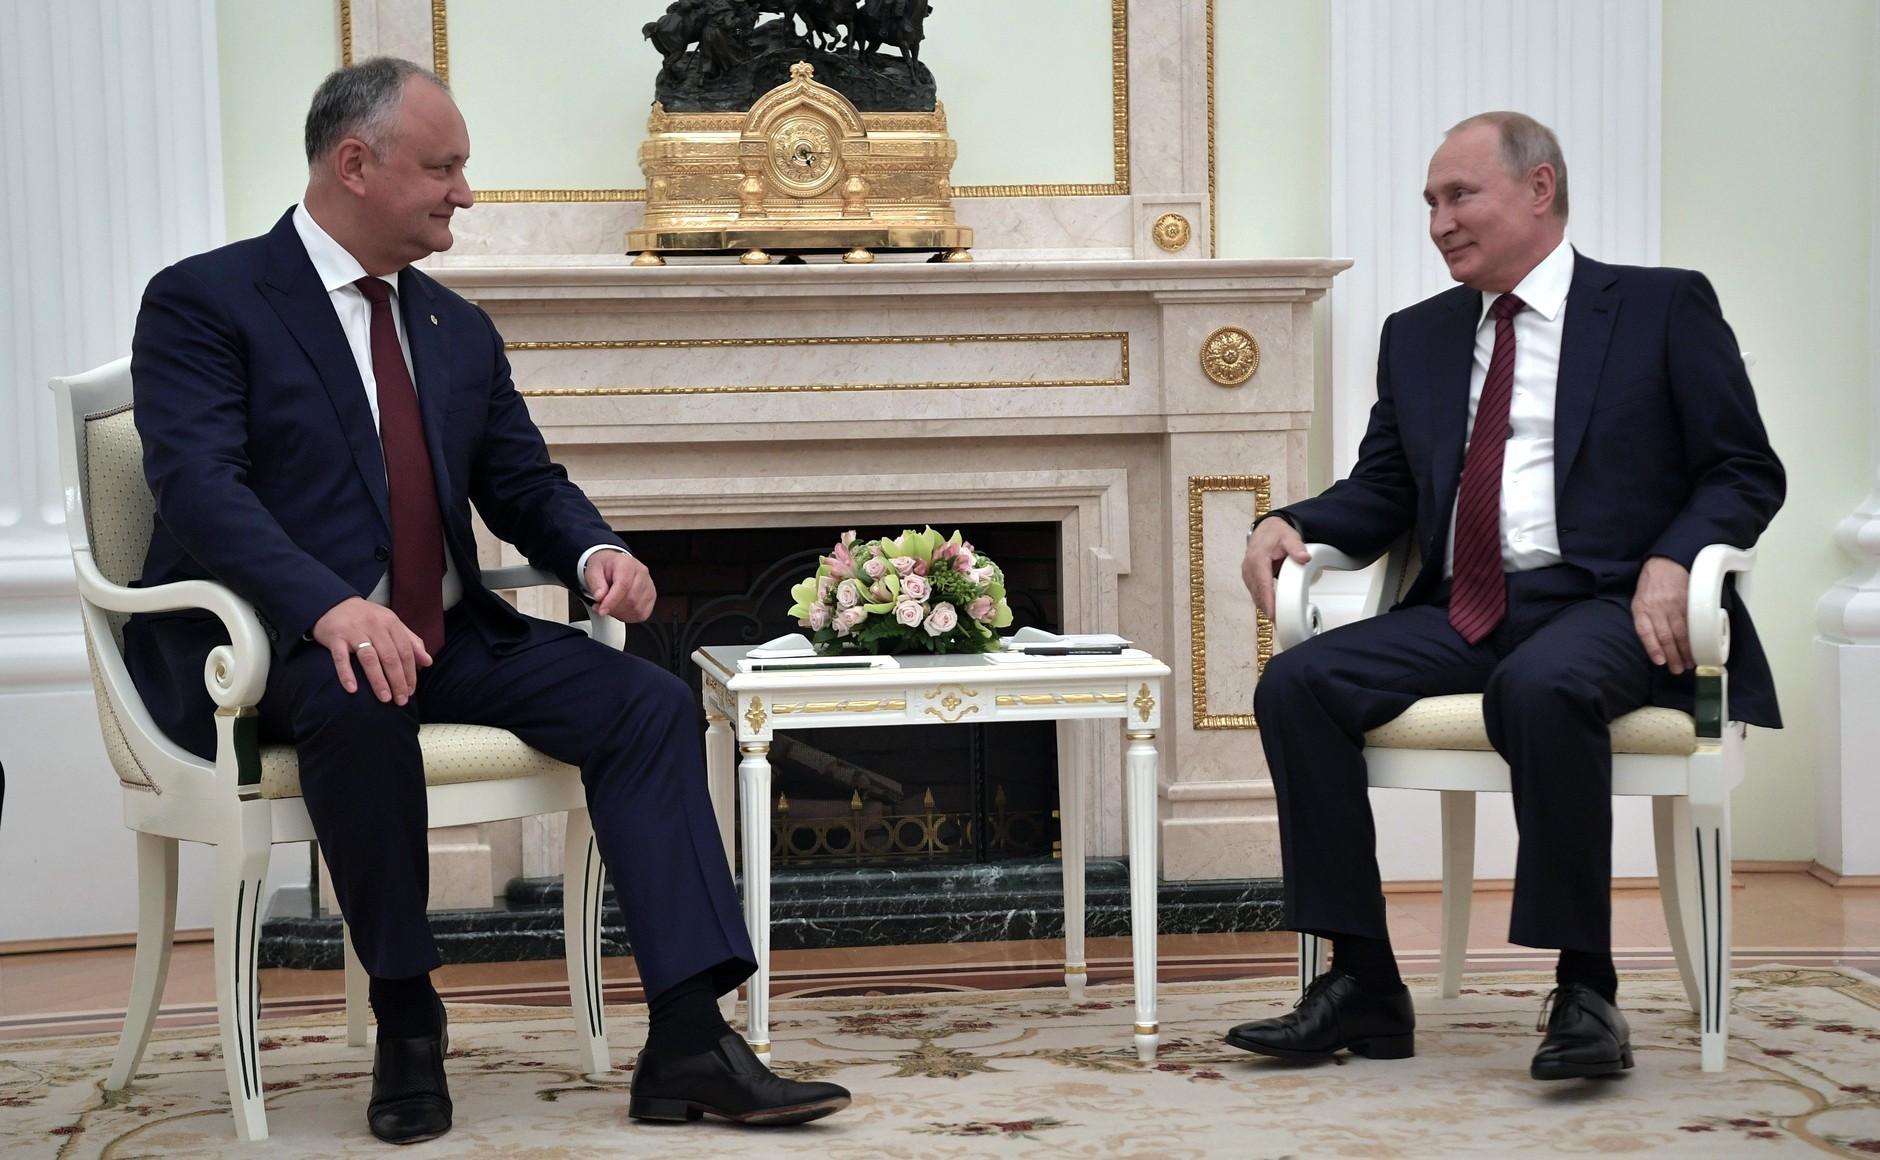 <p>Президент РФ Владимир Путин и президент Молдавии Игорь Додон. Фото © Kremlin</p>